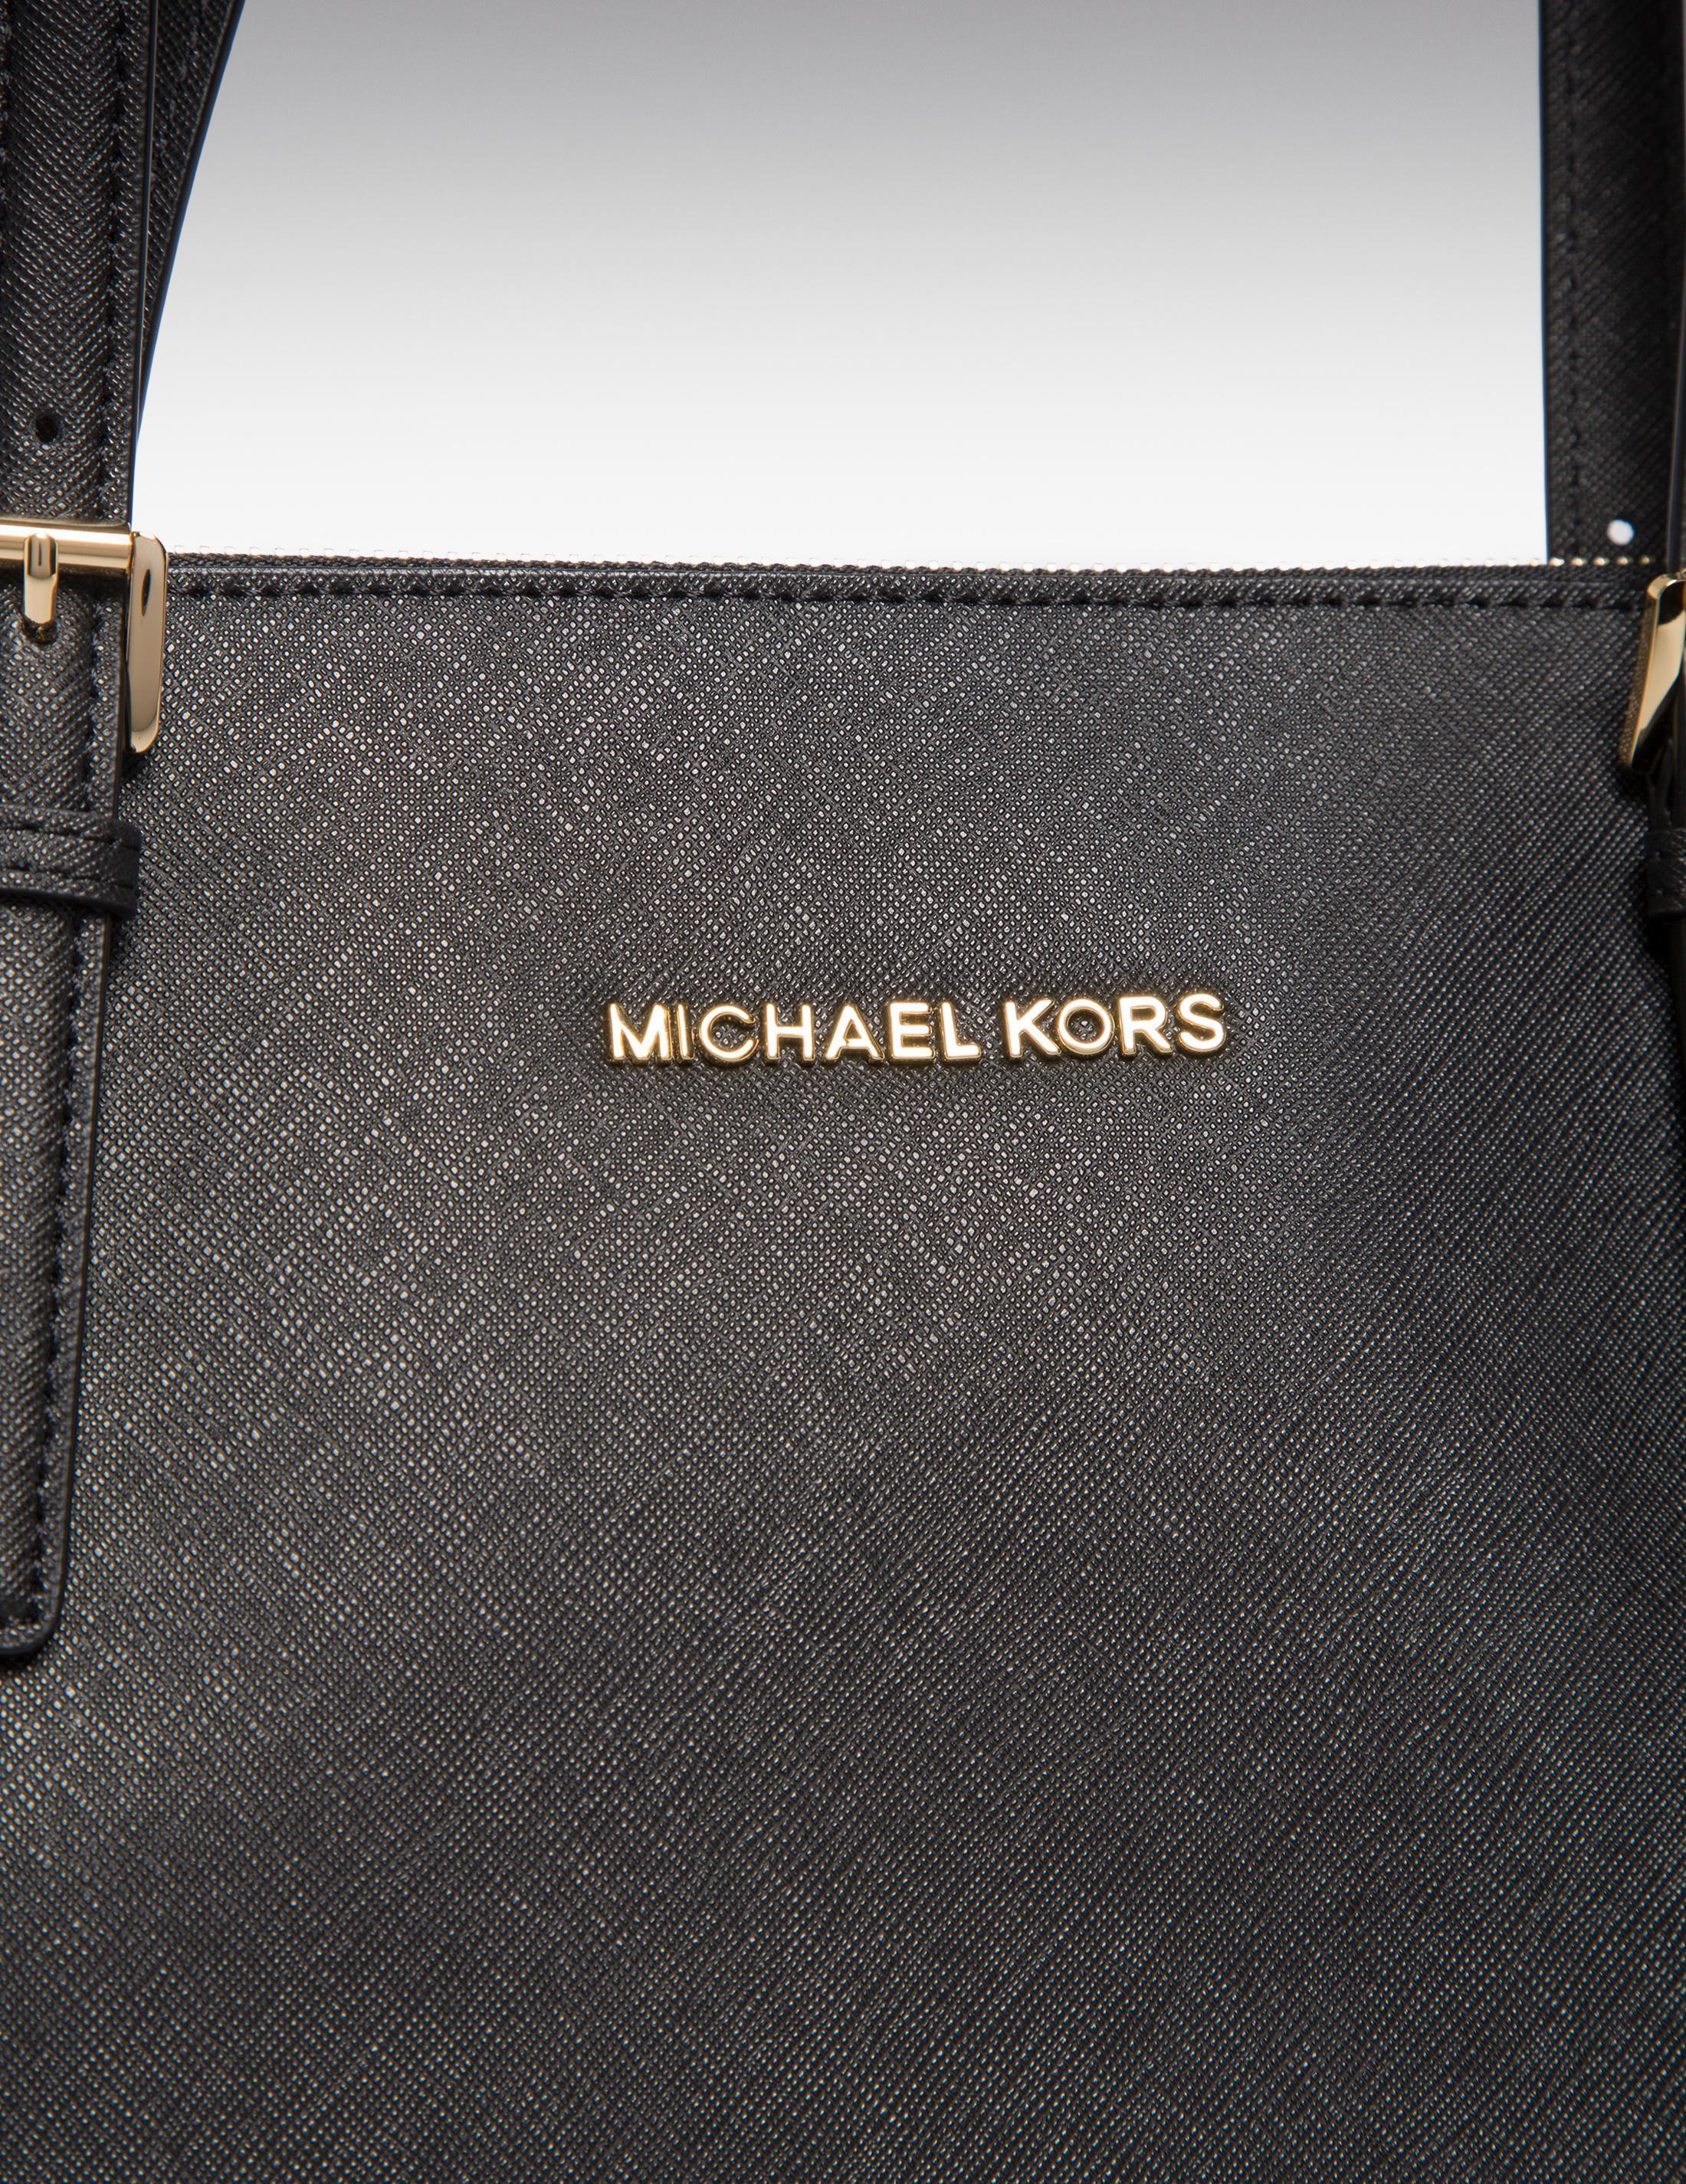 Michael Kors Leather Top Zip Tote Bag Black